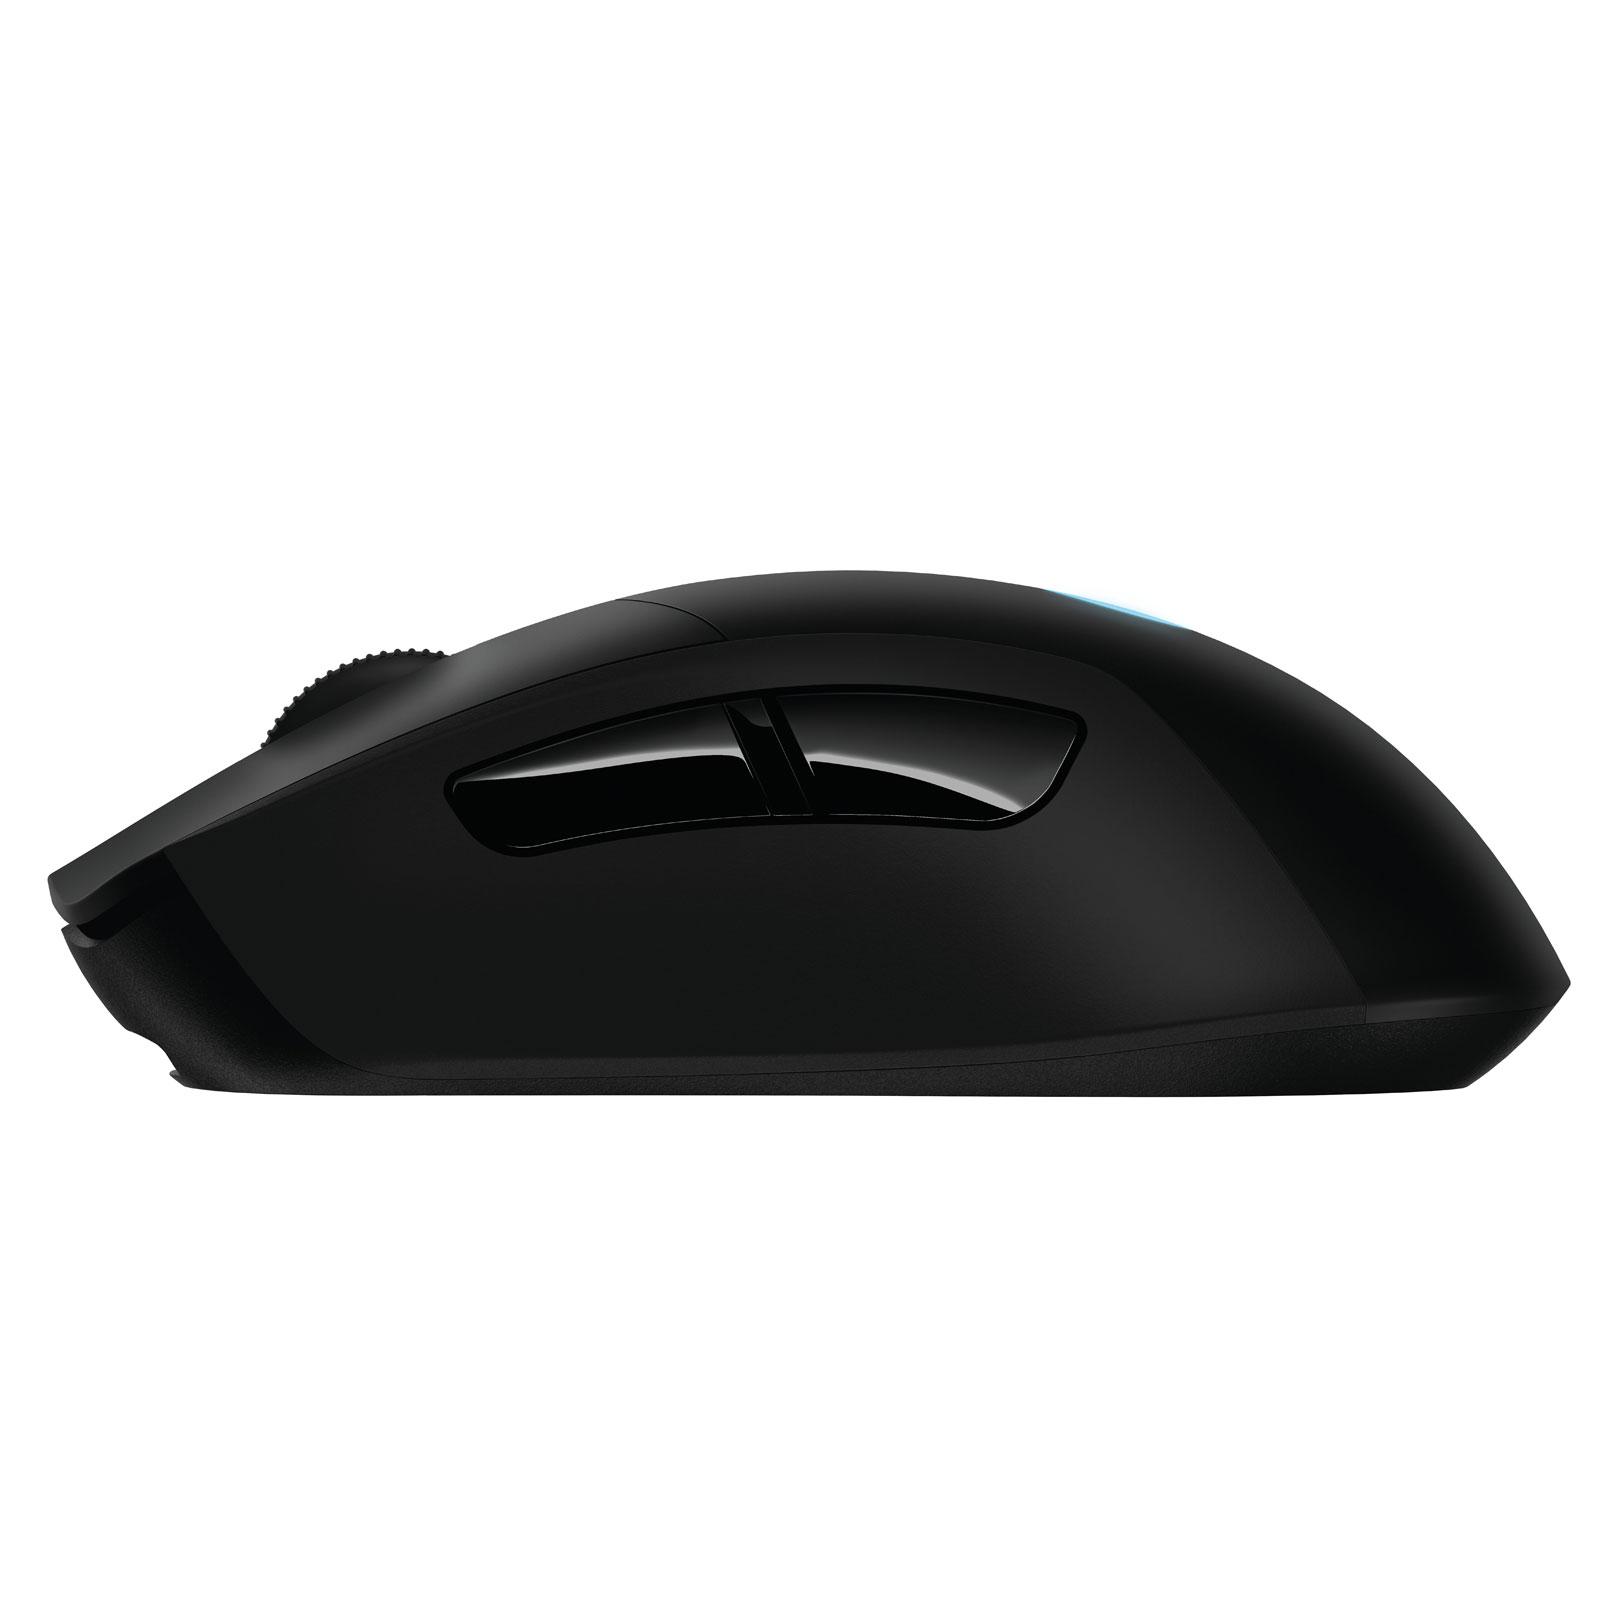 Logitech G403 Wireless - Souris PC Logitech - Cybertek.fr - 2